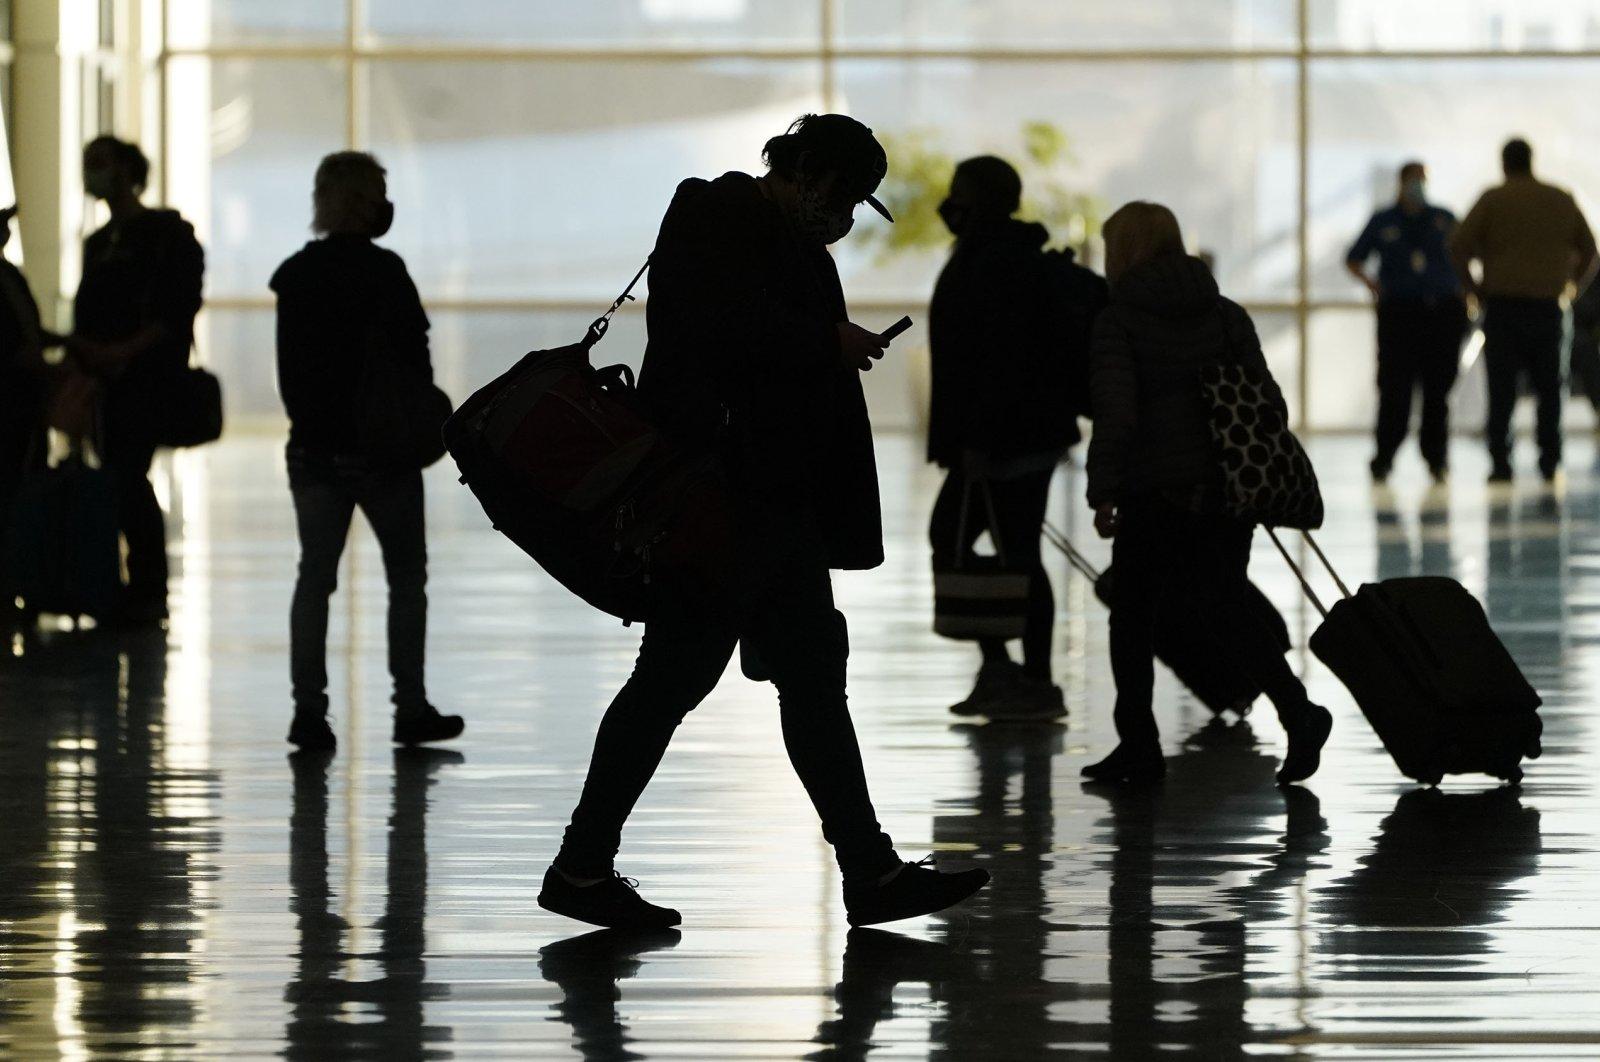 Passengers walk through Salt Lake City International Airport in Salt Lake City, Oct. 27, 2020. (AP Photo)